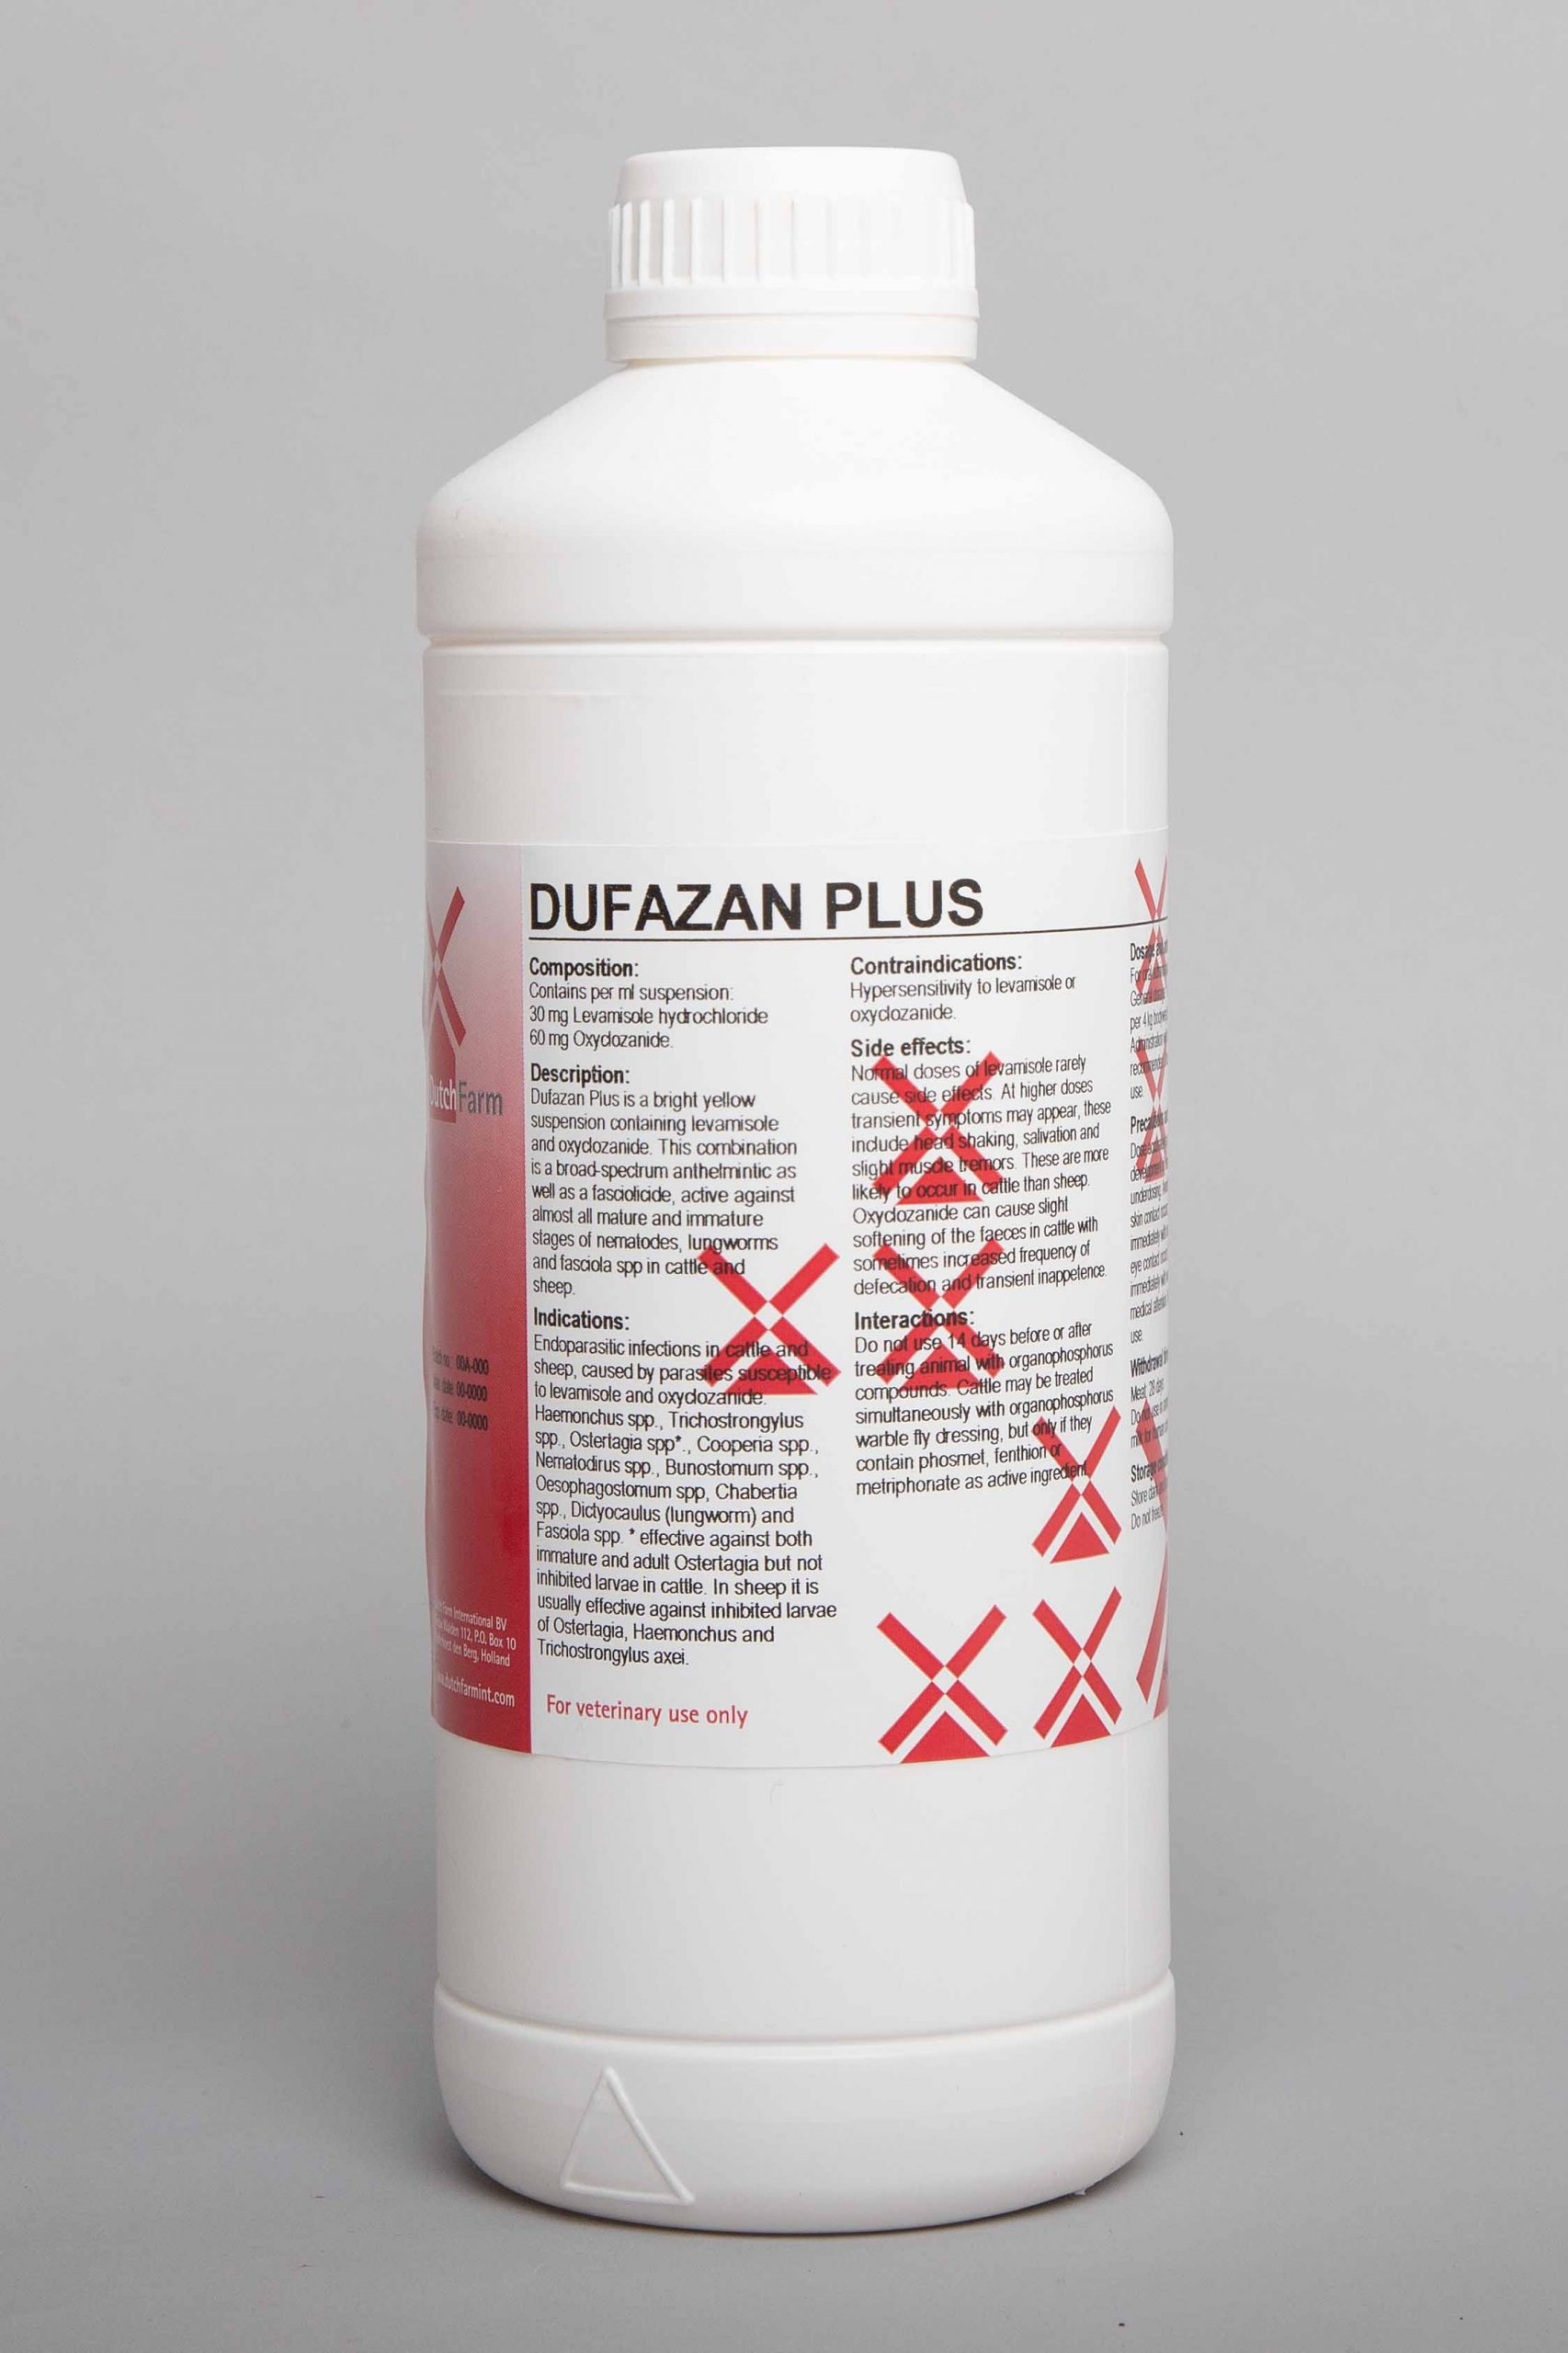 Dufazan Plus